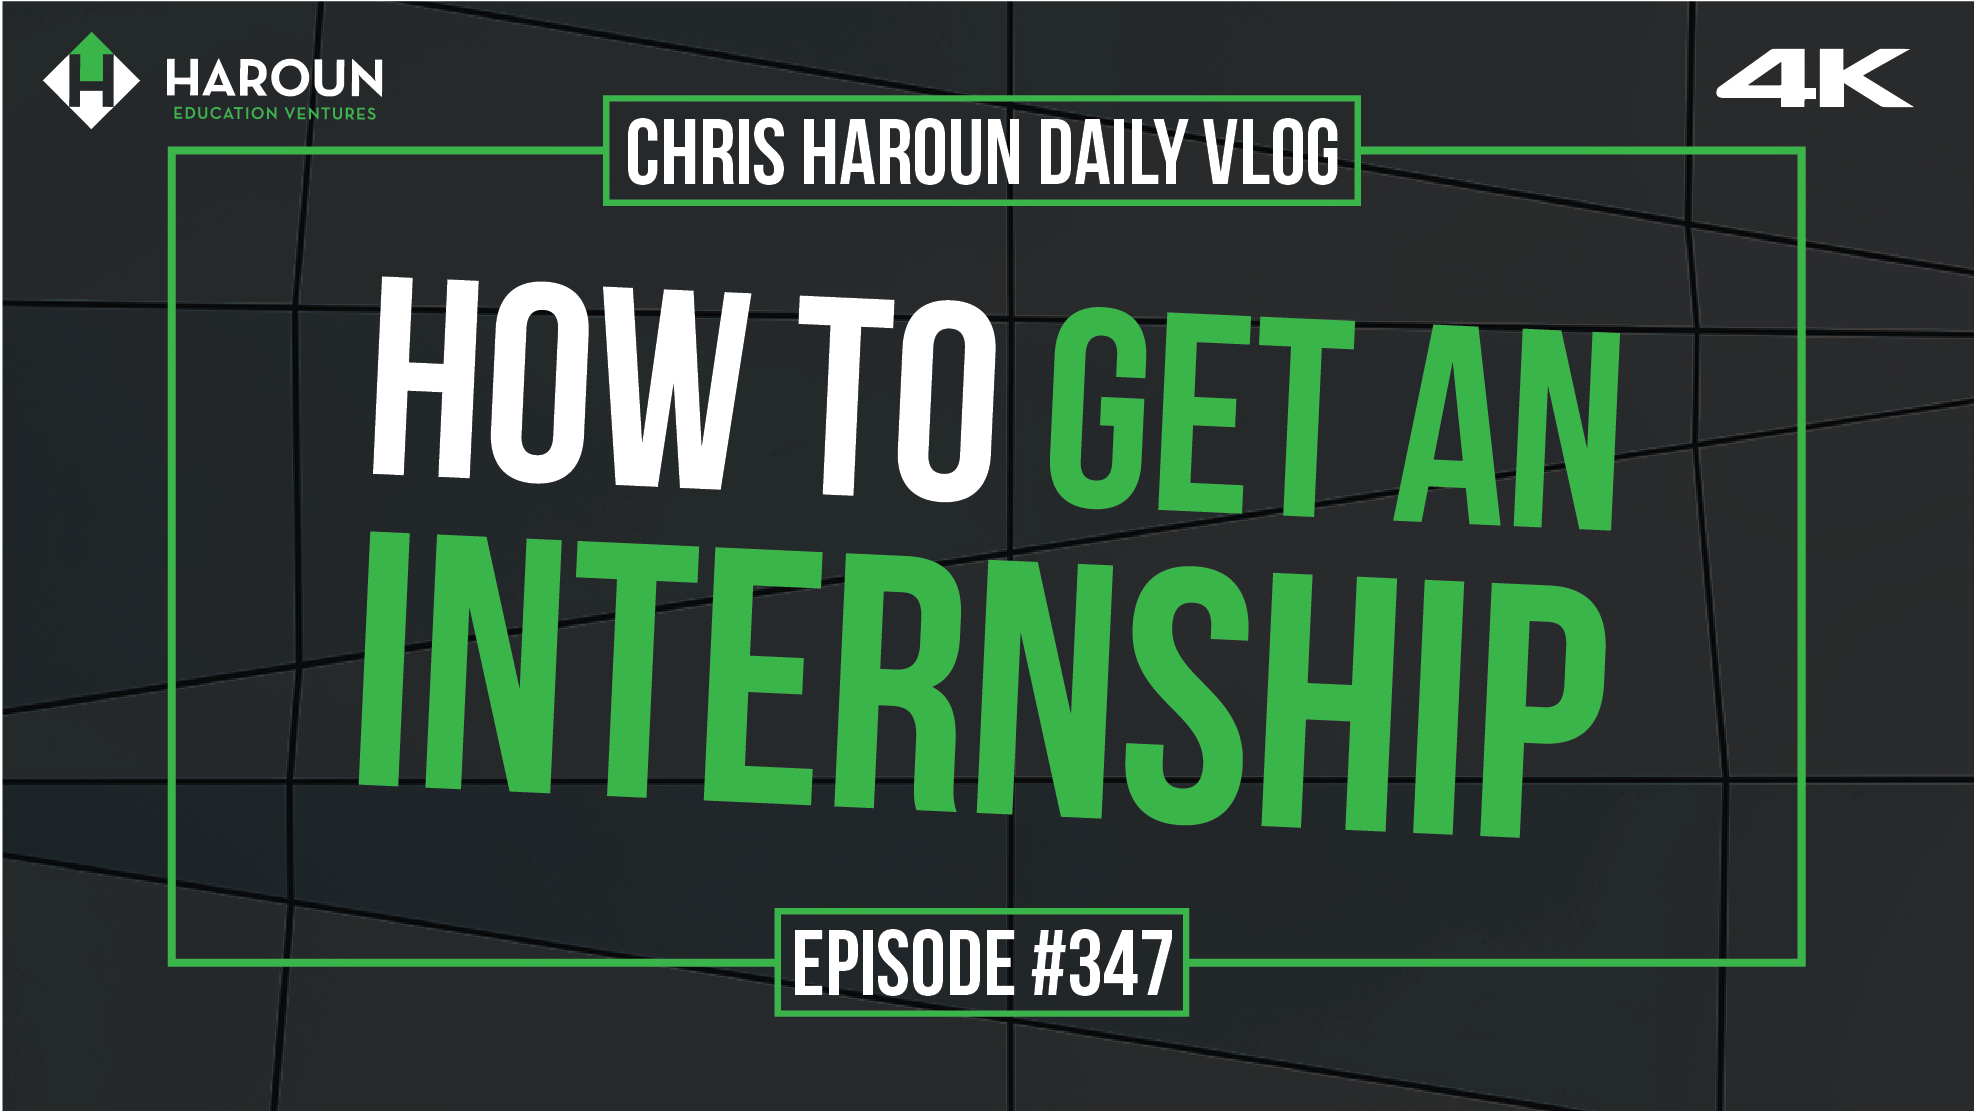 VLOG_347_7_13_2019_How to Get An Internship.png